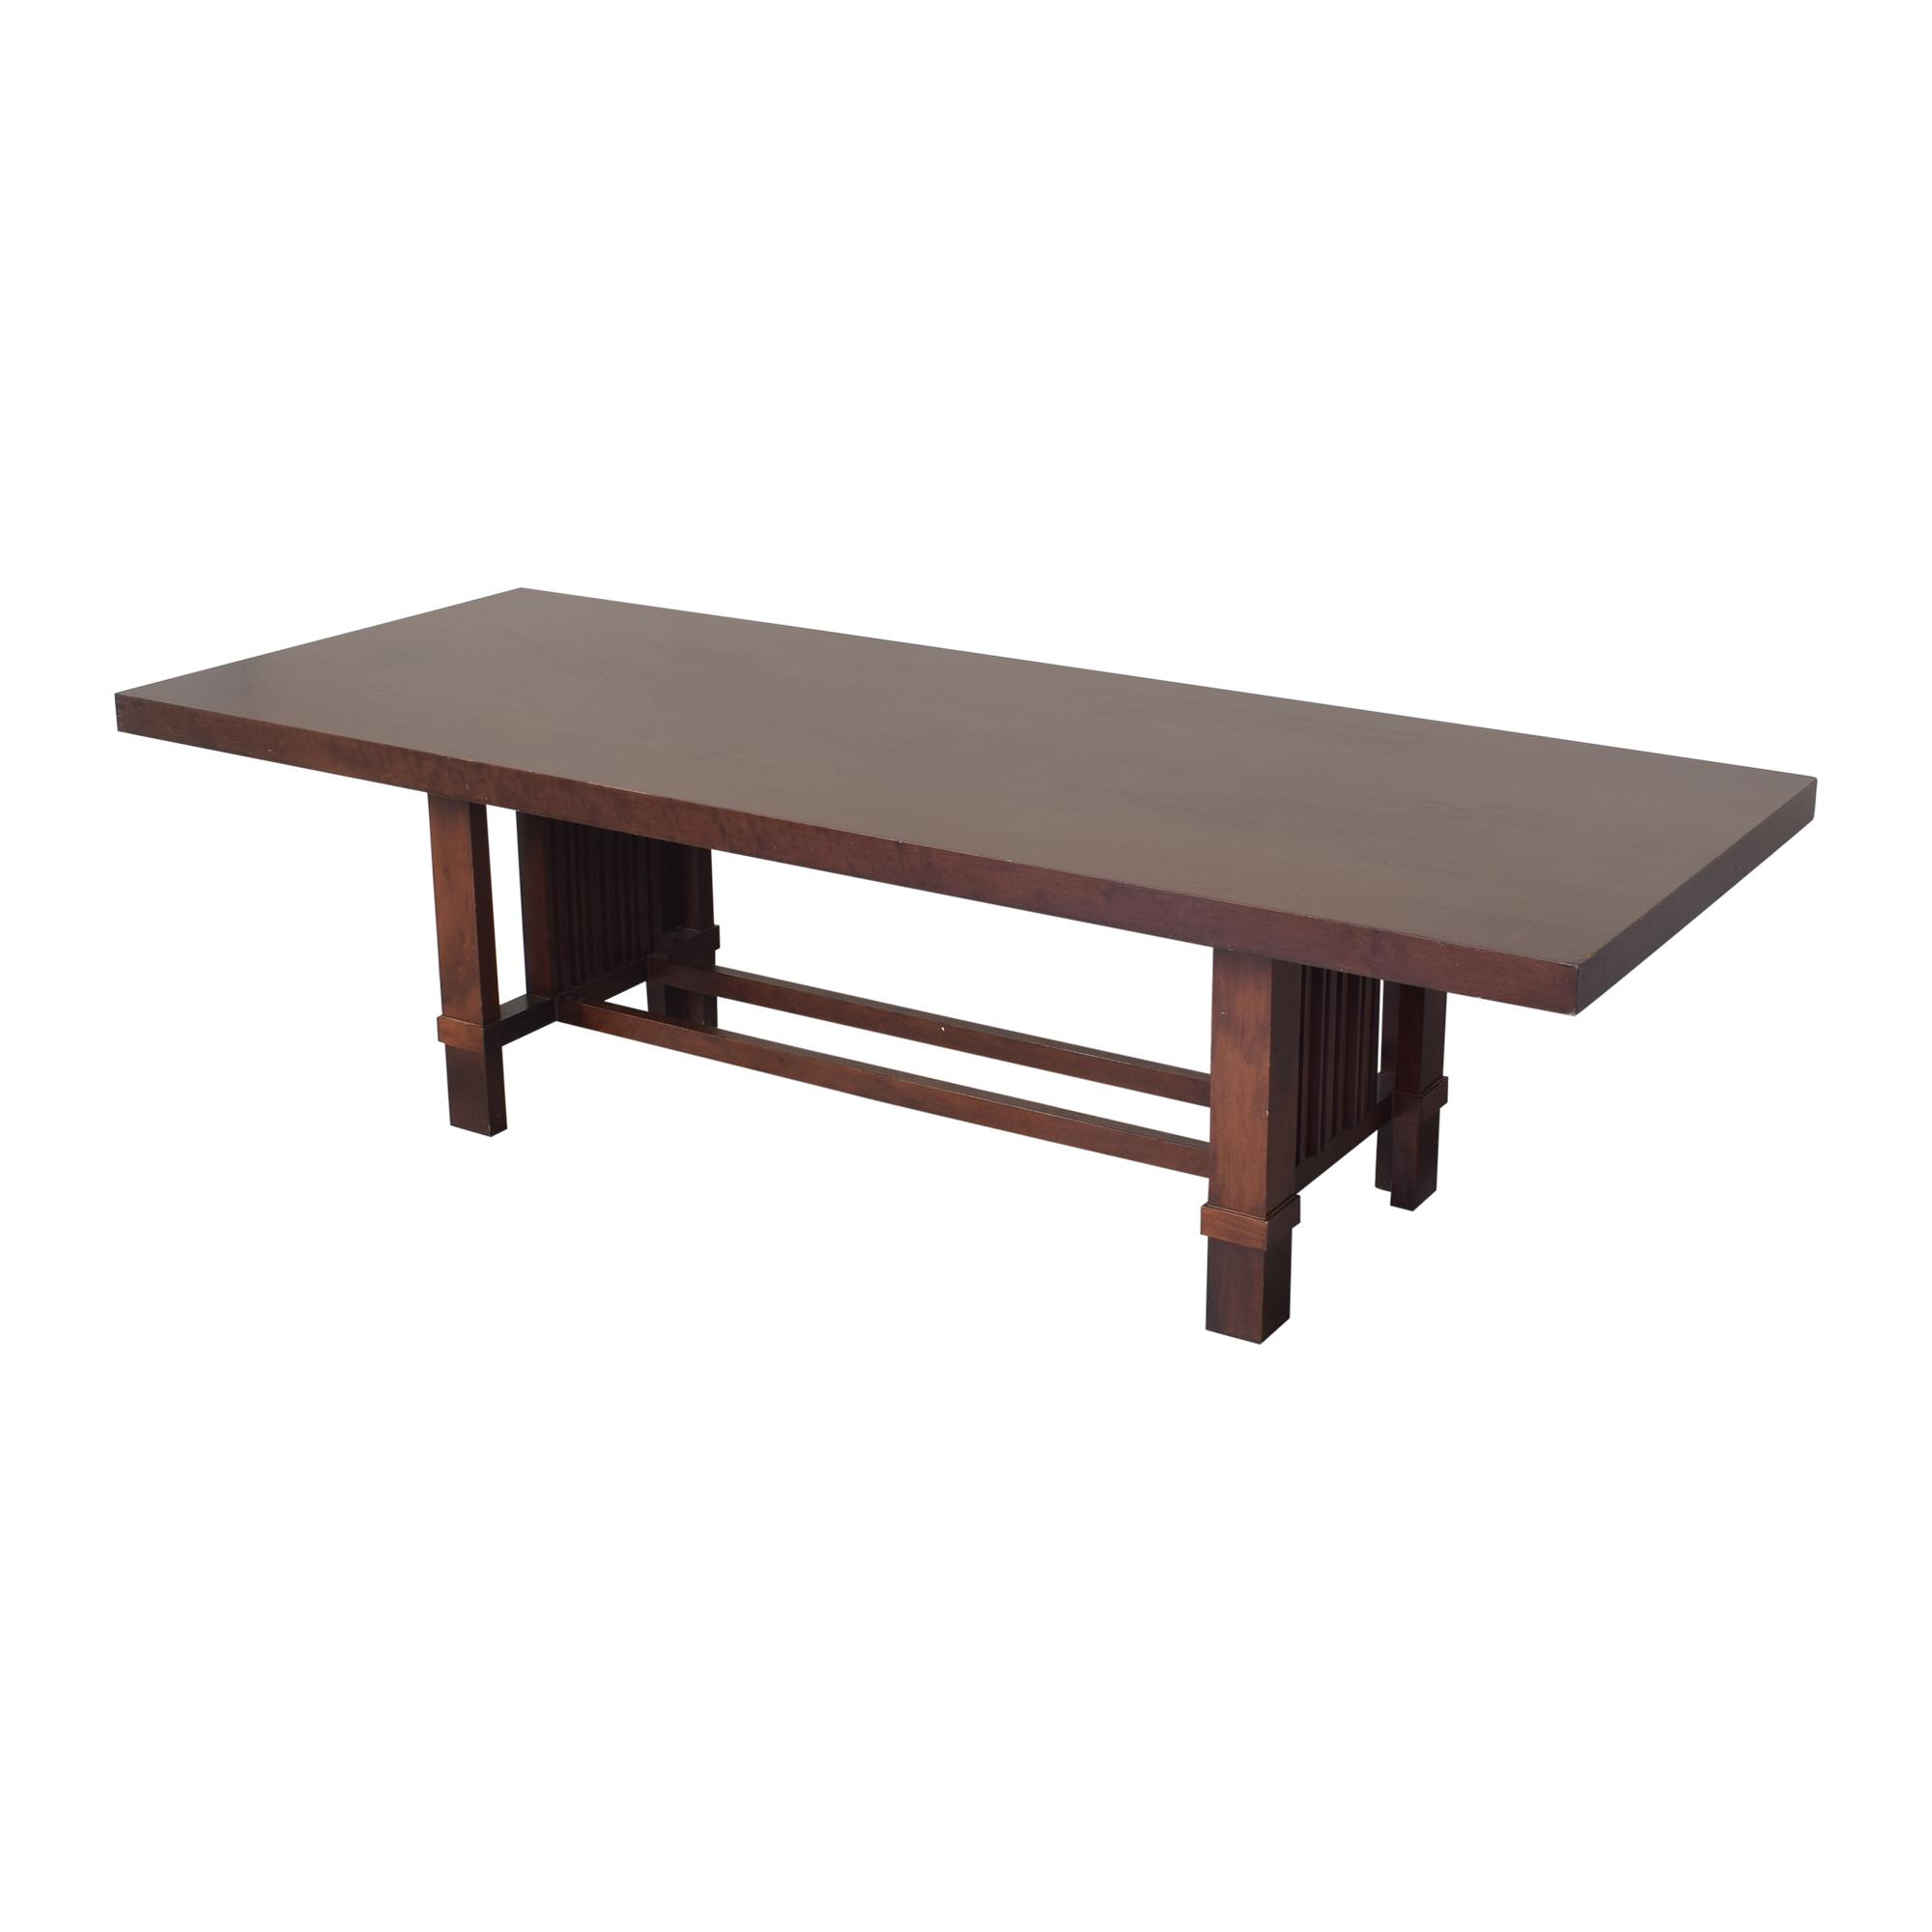 Cassina Frank Lloyd Wright Taliesin Dining Table / Dinner Tables